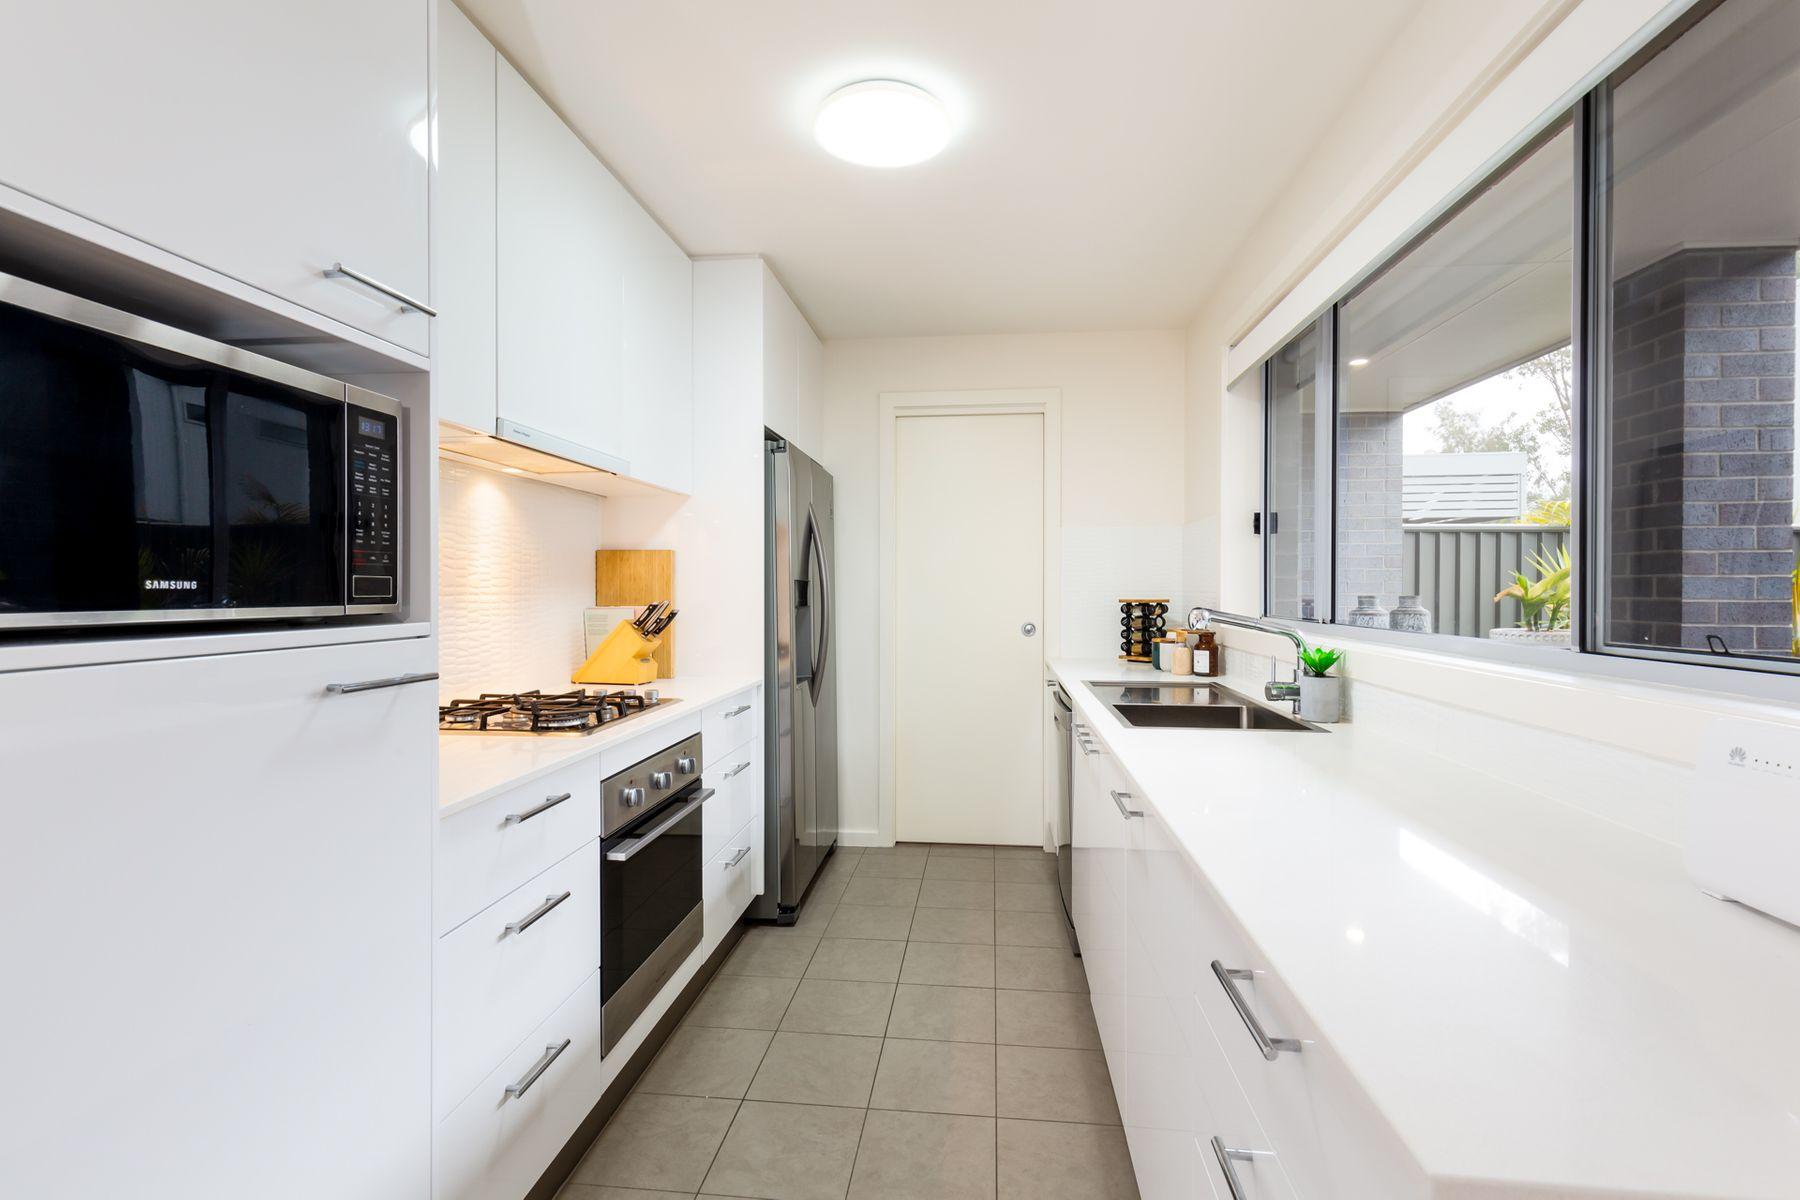 2/36 Queen Street, Warners Bay, NSW 2282